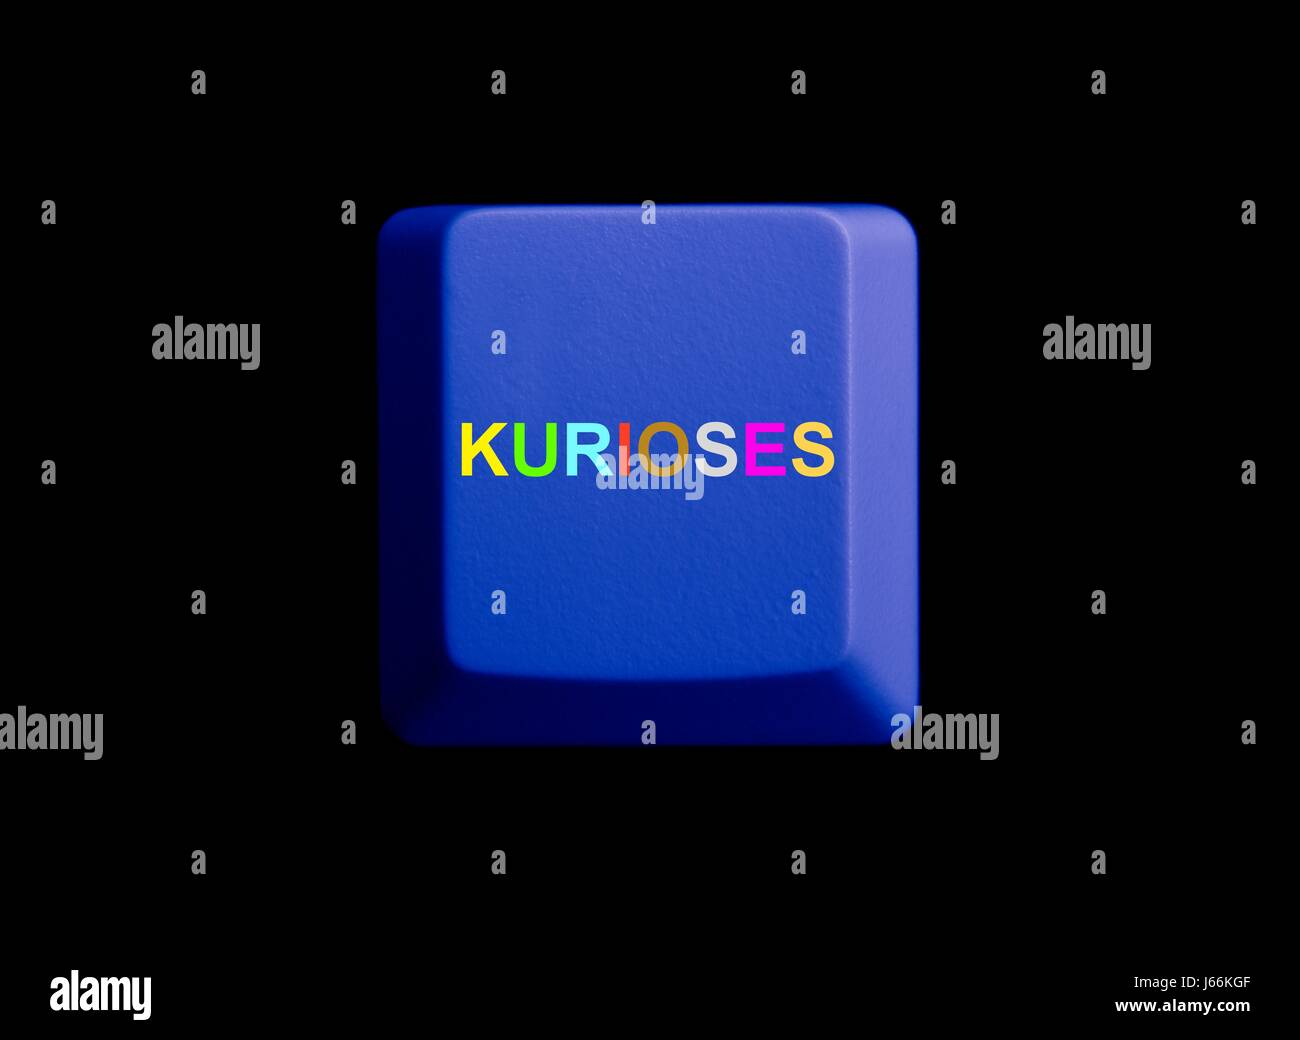 curiosities on the internet - Stock Image